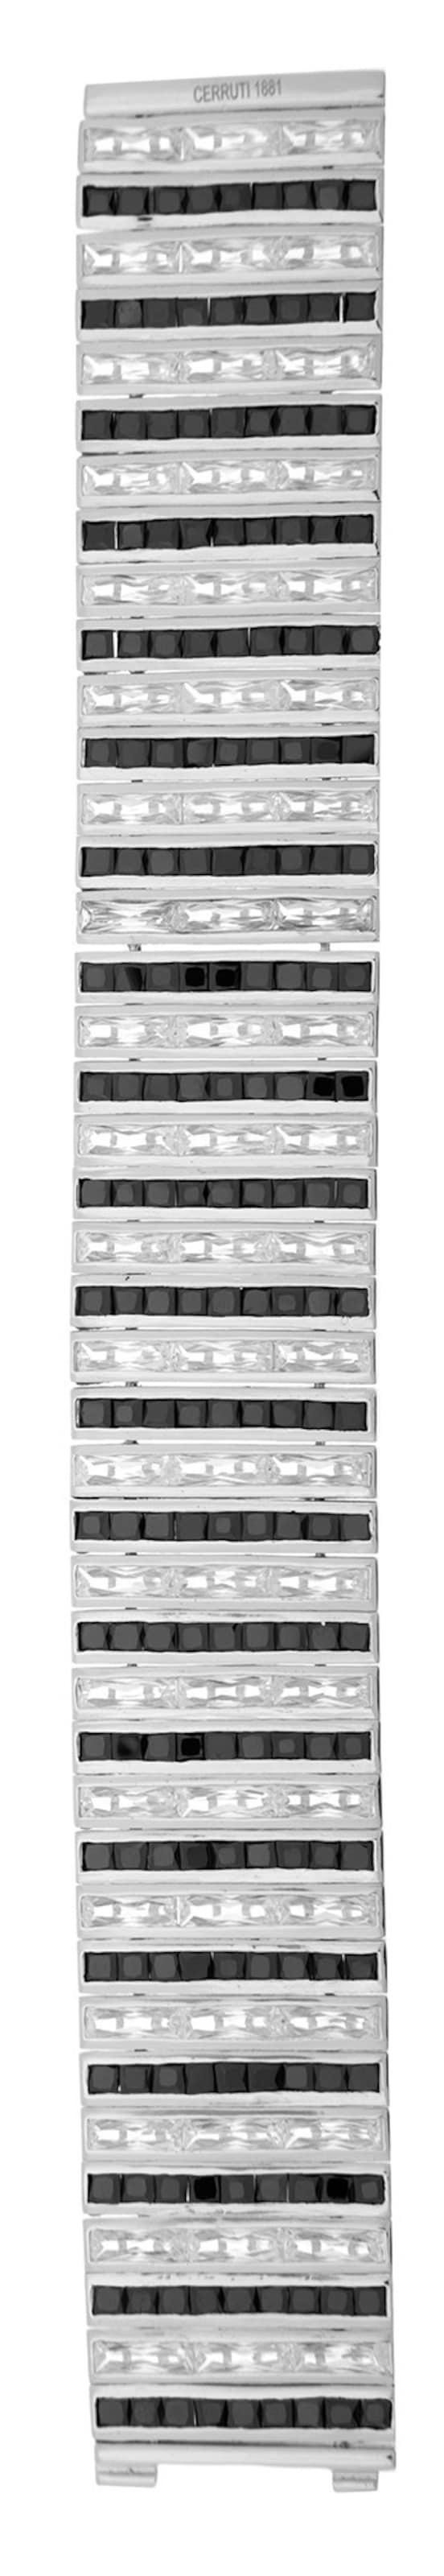 CERRUTI Armband 'R52002ZN' Mit Kreditkarte Zu Verkaufen AkyxvW1